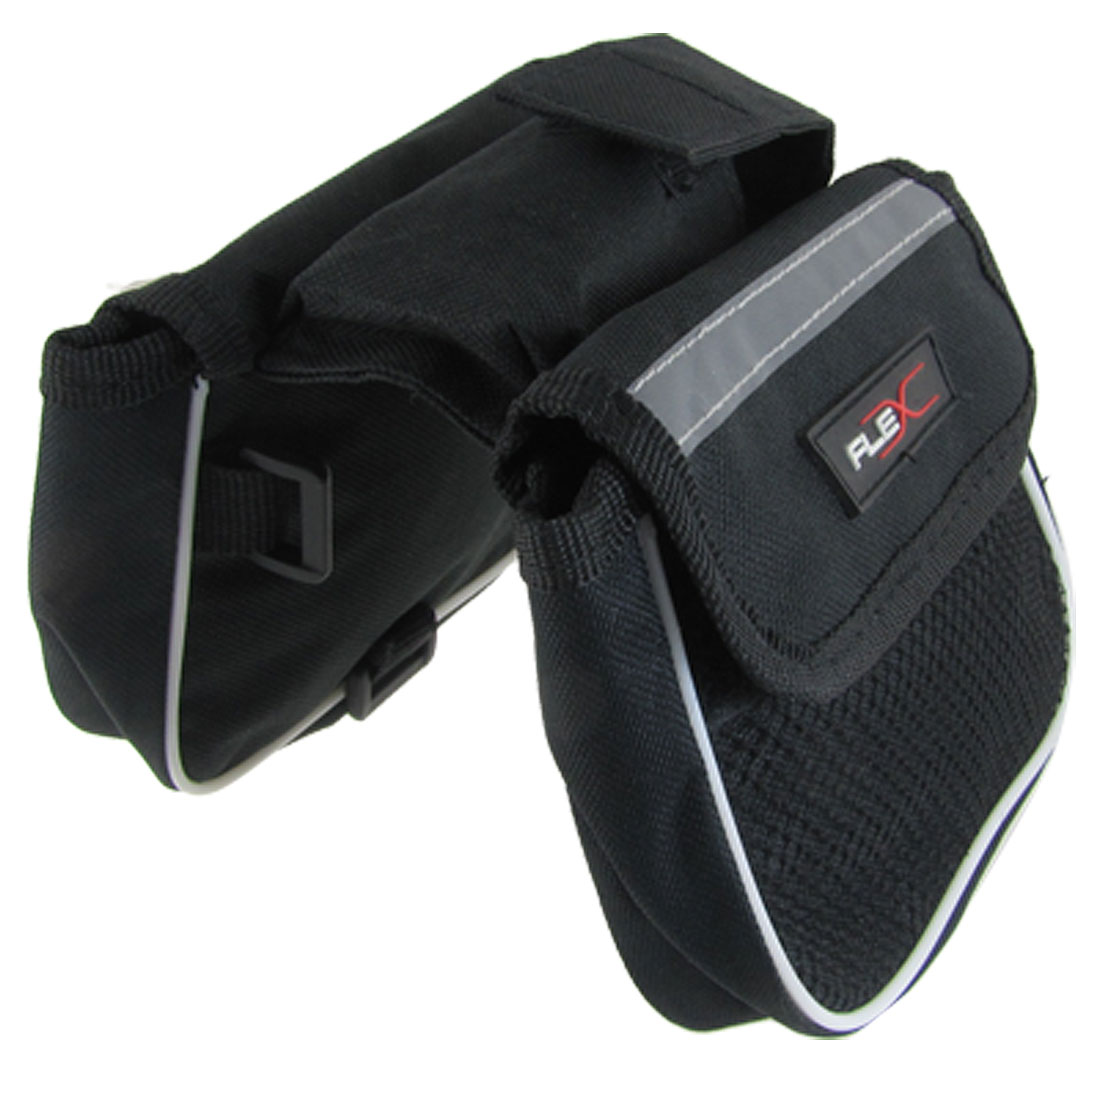 Bike Bicycle Detachable Closure Double Saddle Front Bag Black